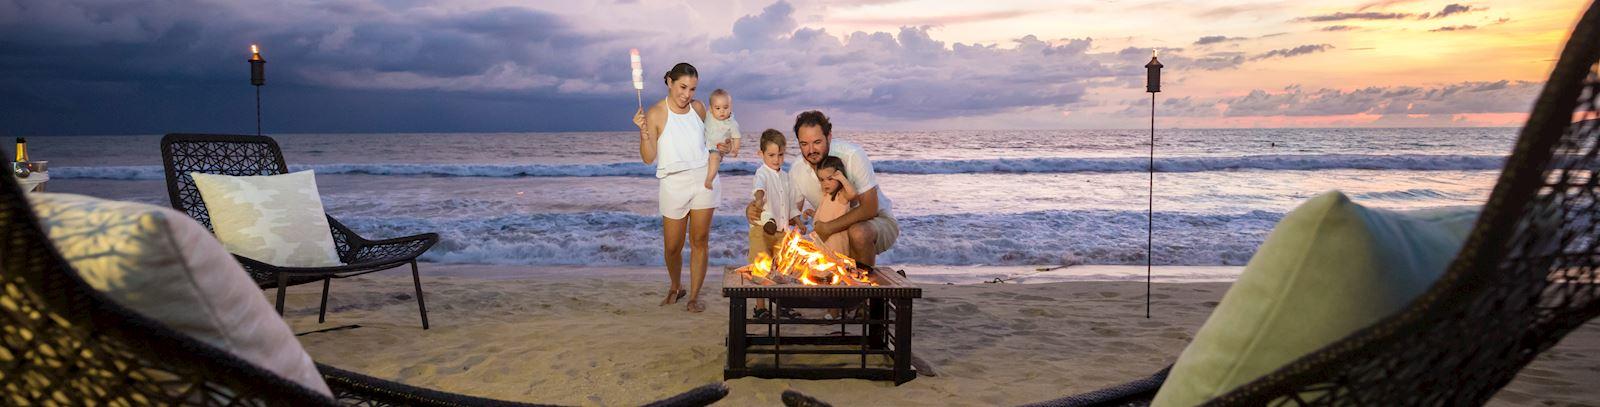 Bonfire by the beach - grand velas riviera nayarit